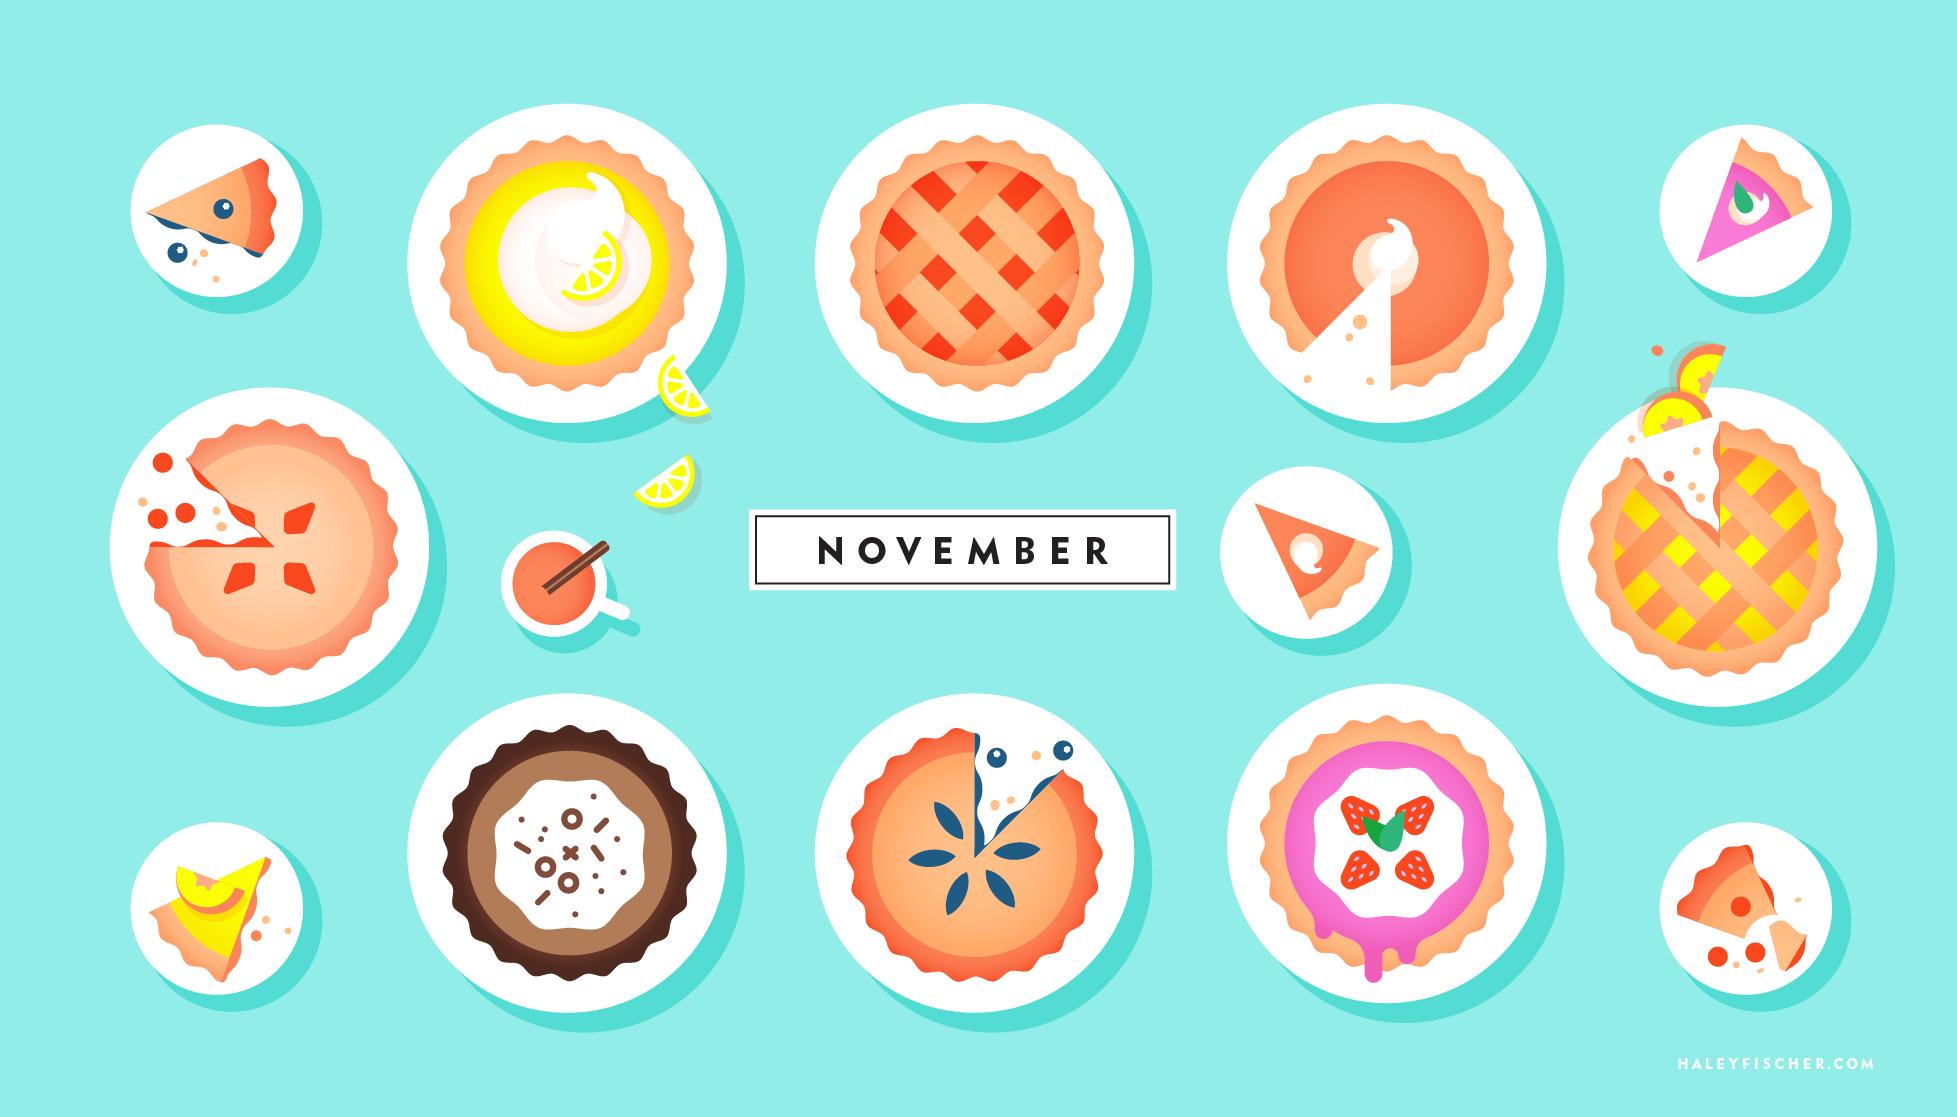 November Wallpaper Download Here